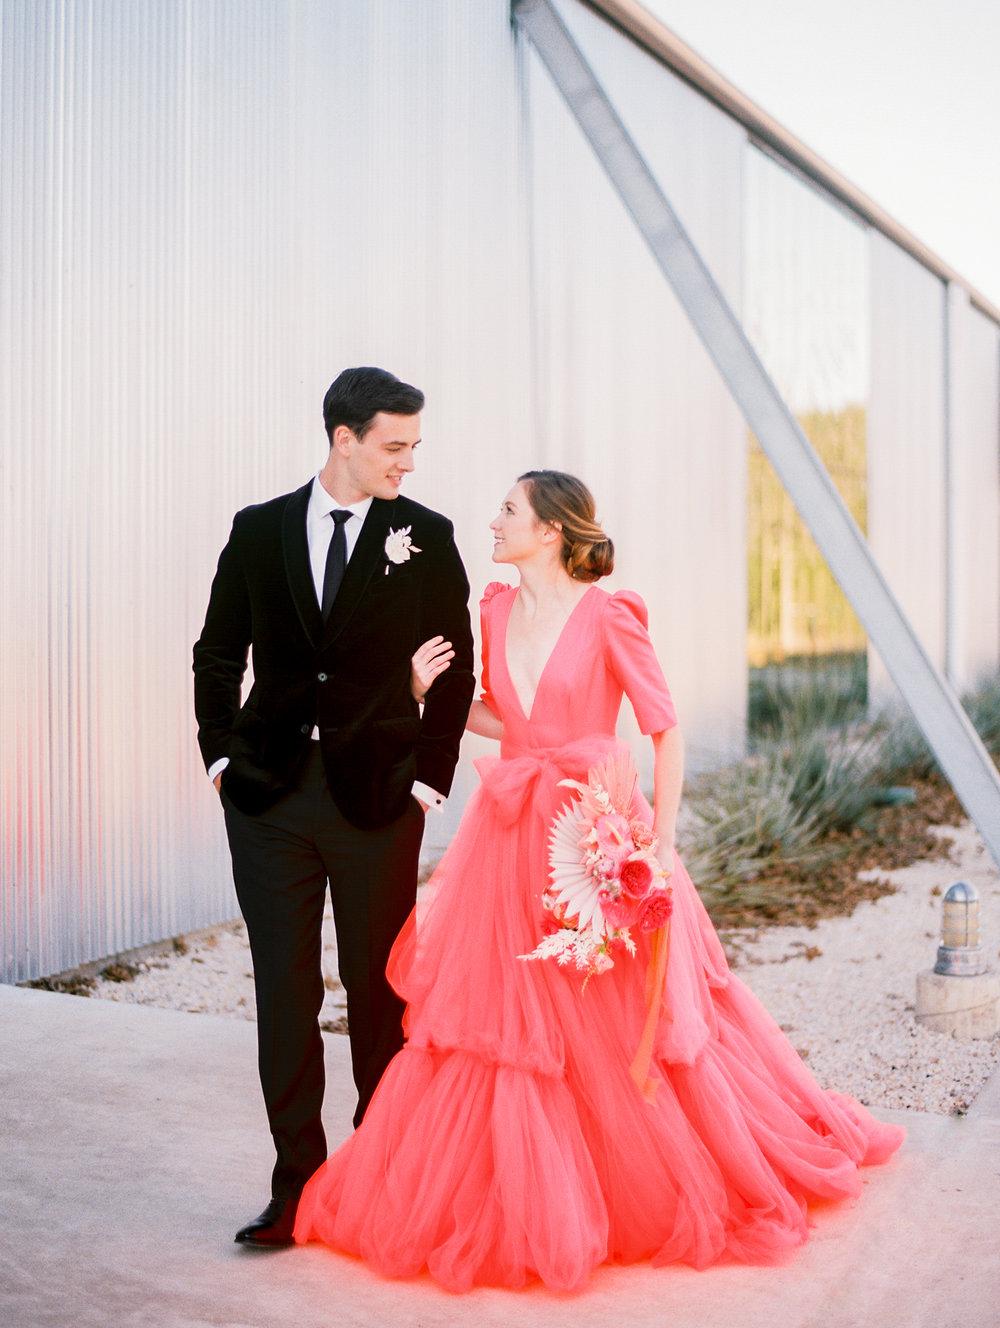 Kristin-La-Voie-Photography-Austin-Wedding-Photographer-Prospect-House-21.jpg